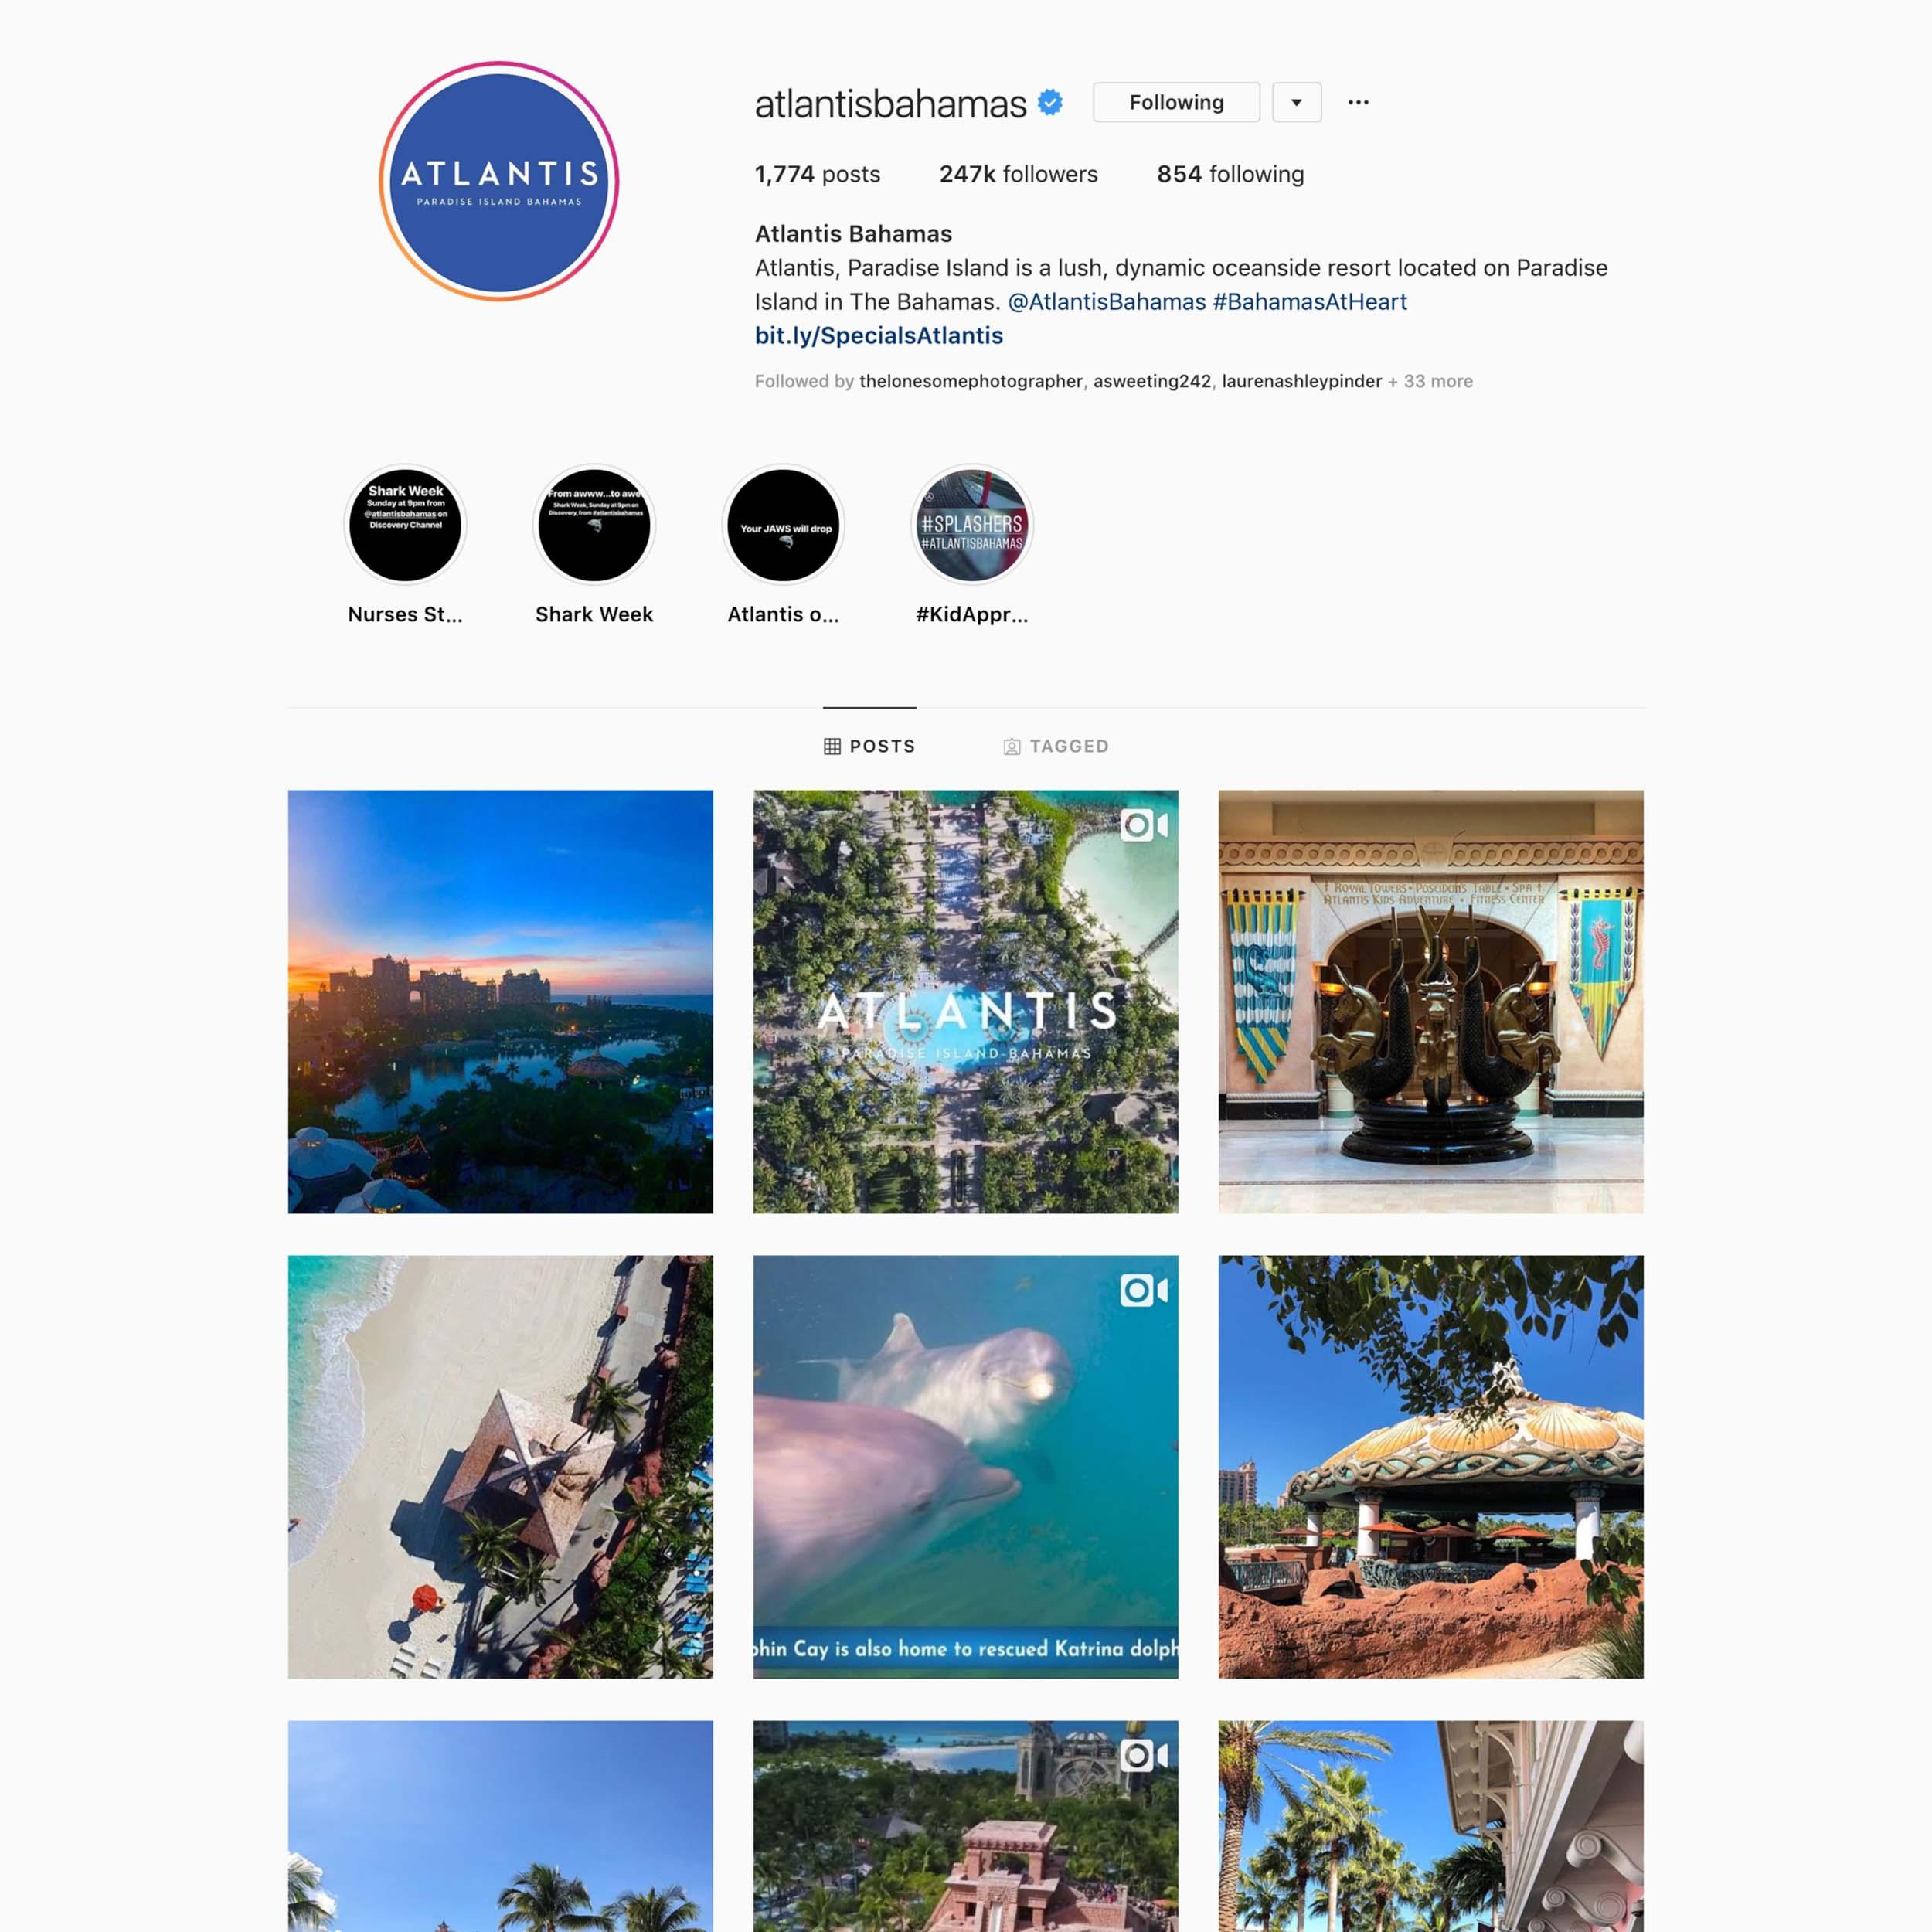 Instagram Social Campaign - Some description here